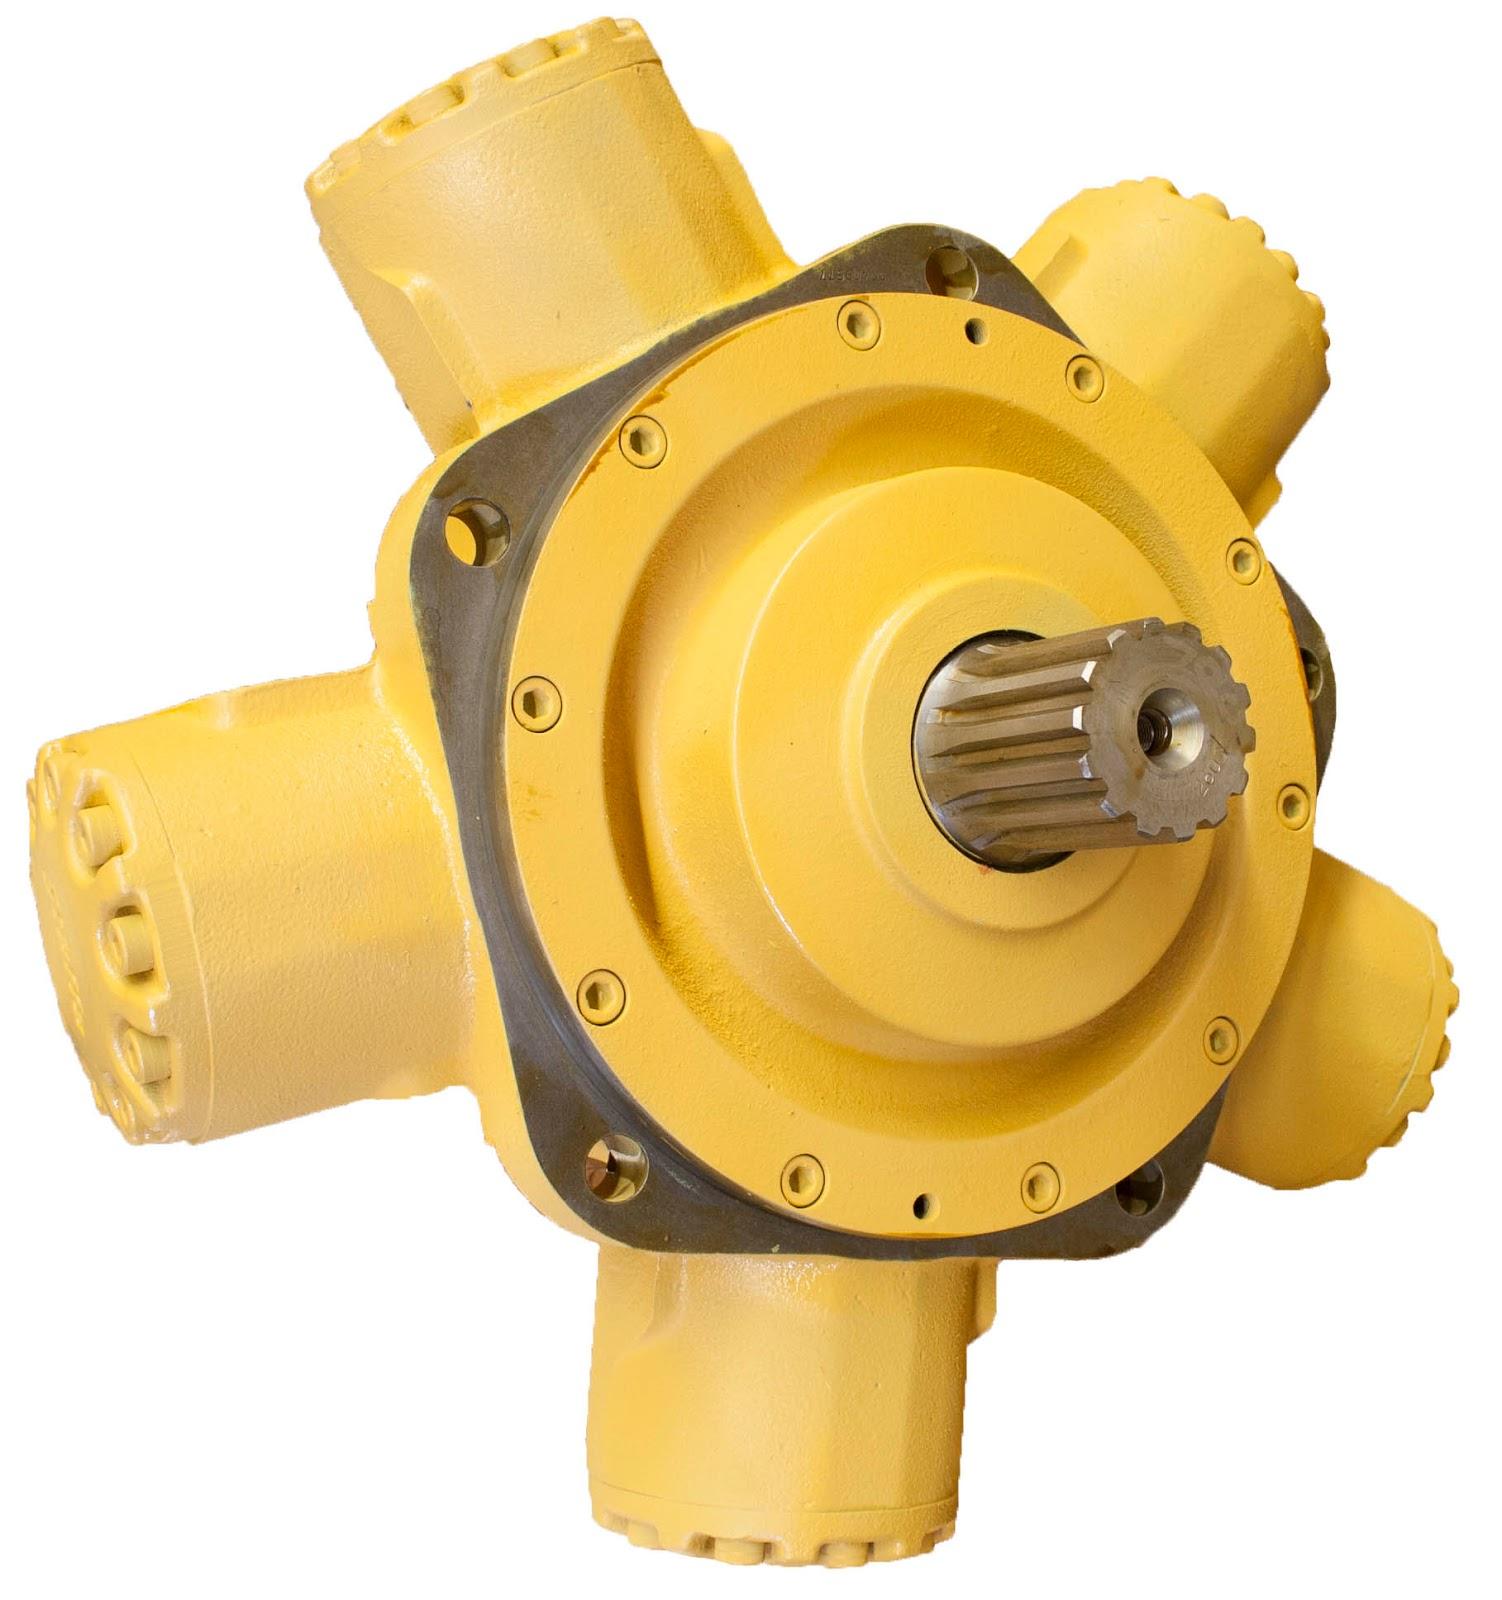 Radial Piston Hydraulic Motor : Flint hydraulics inc staffa radial piston motors